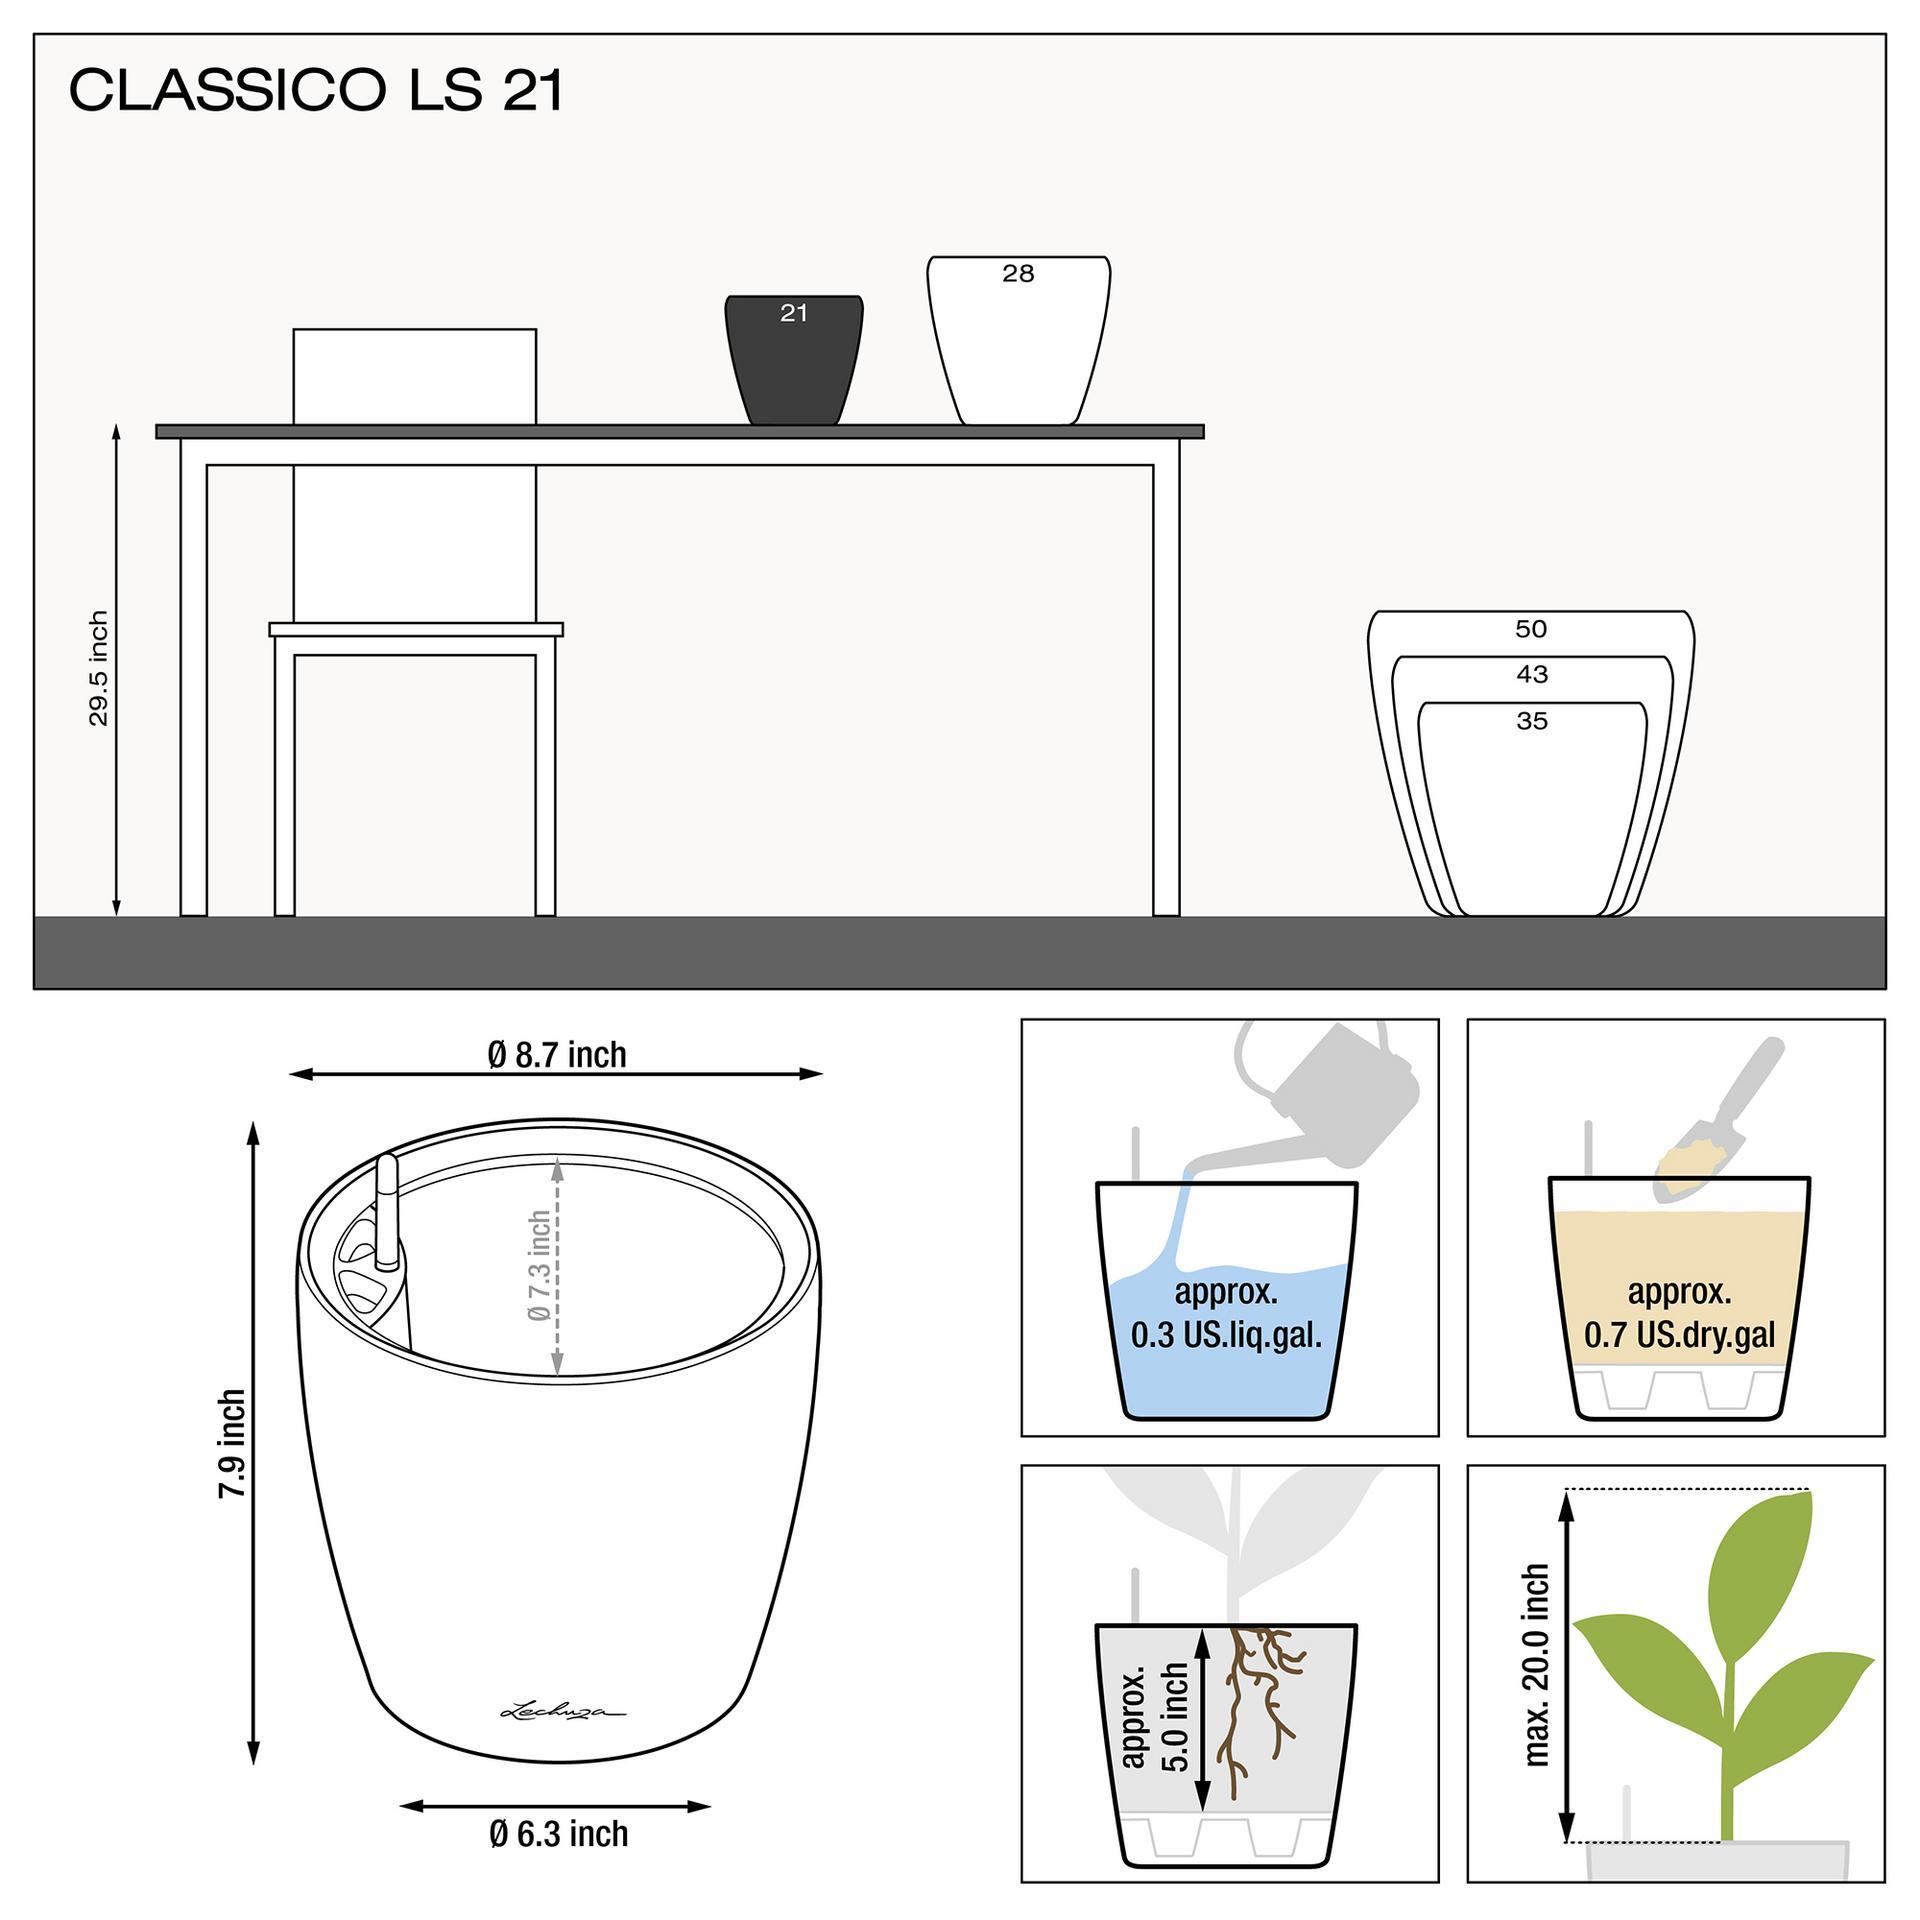 le_classico-ls21_product_addi_nz_us